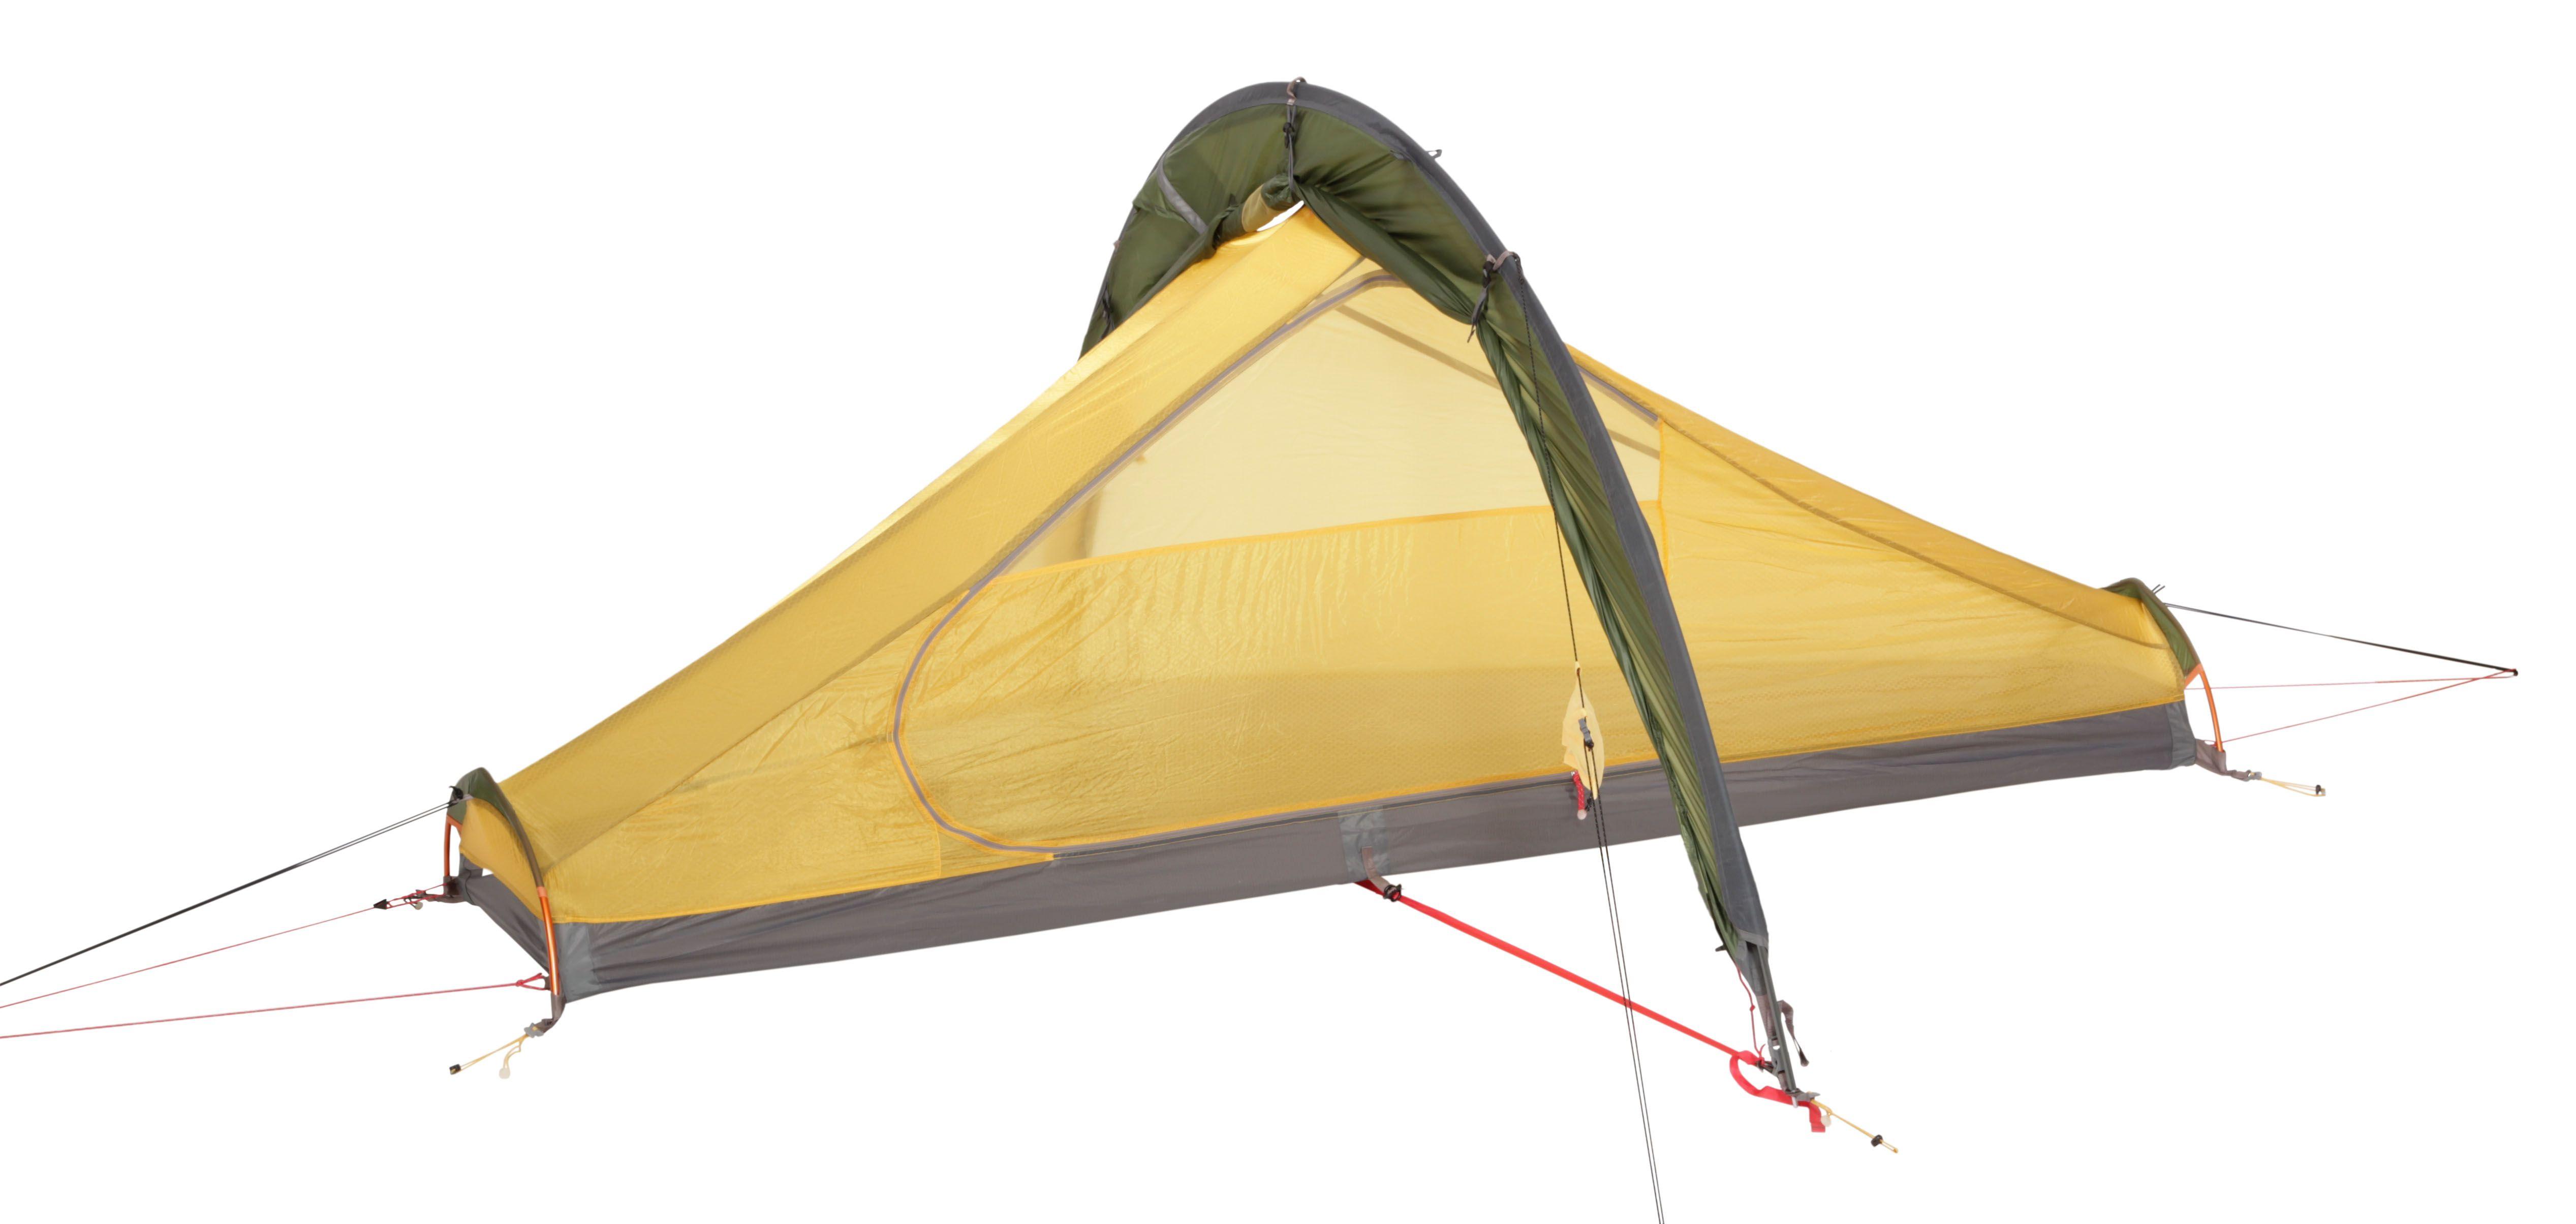 Tente Exped Vela I Extreme.